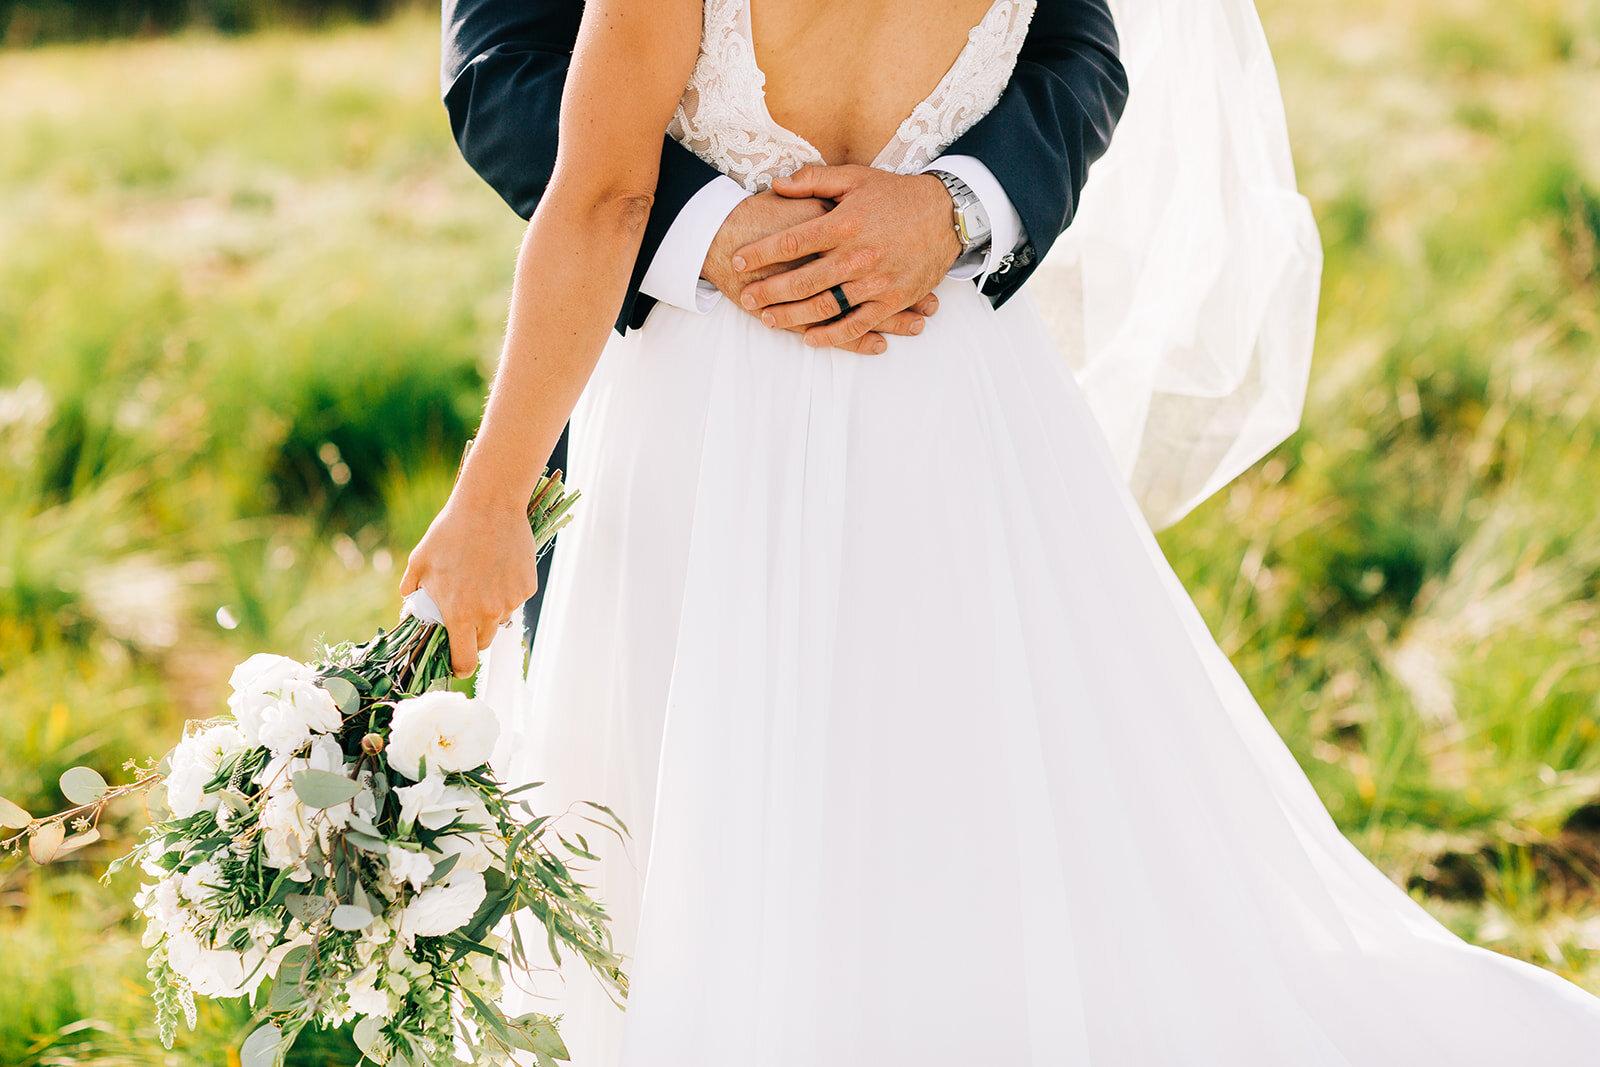 bride and groom spokane field shoot